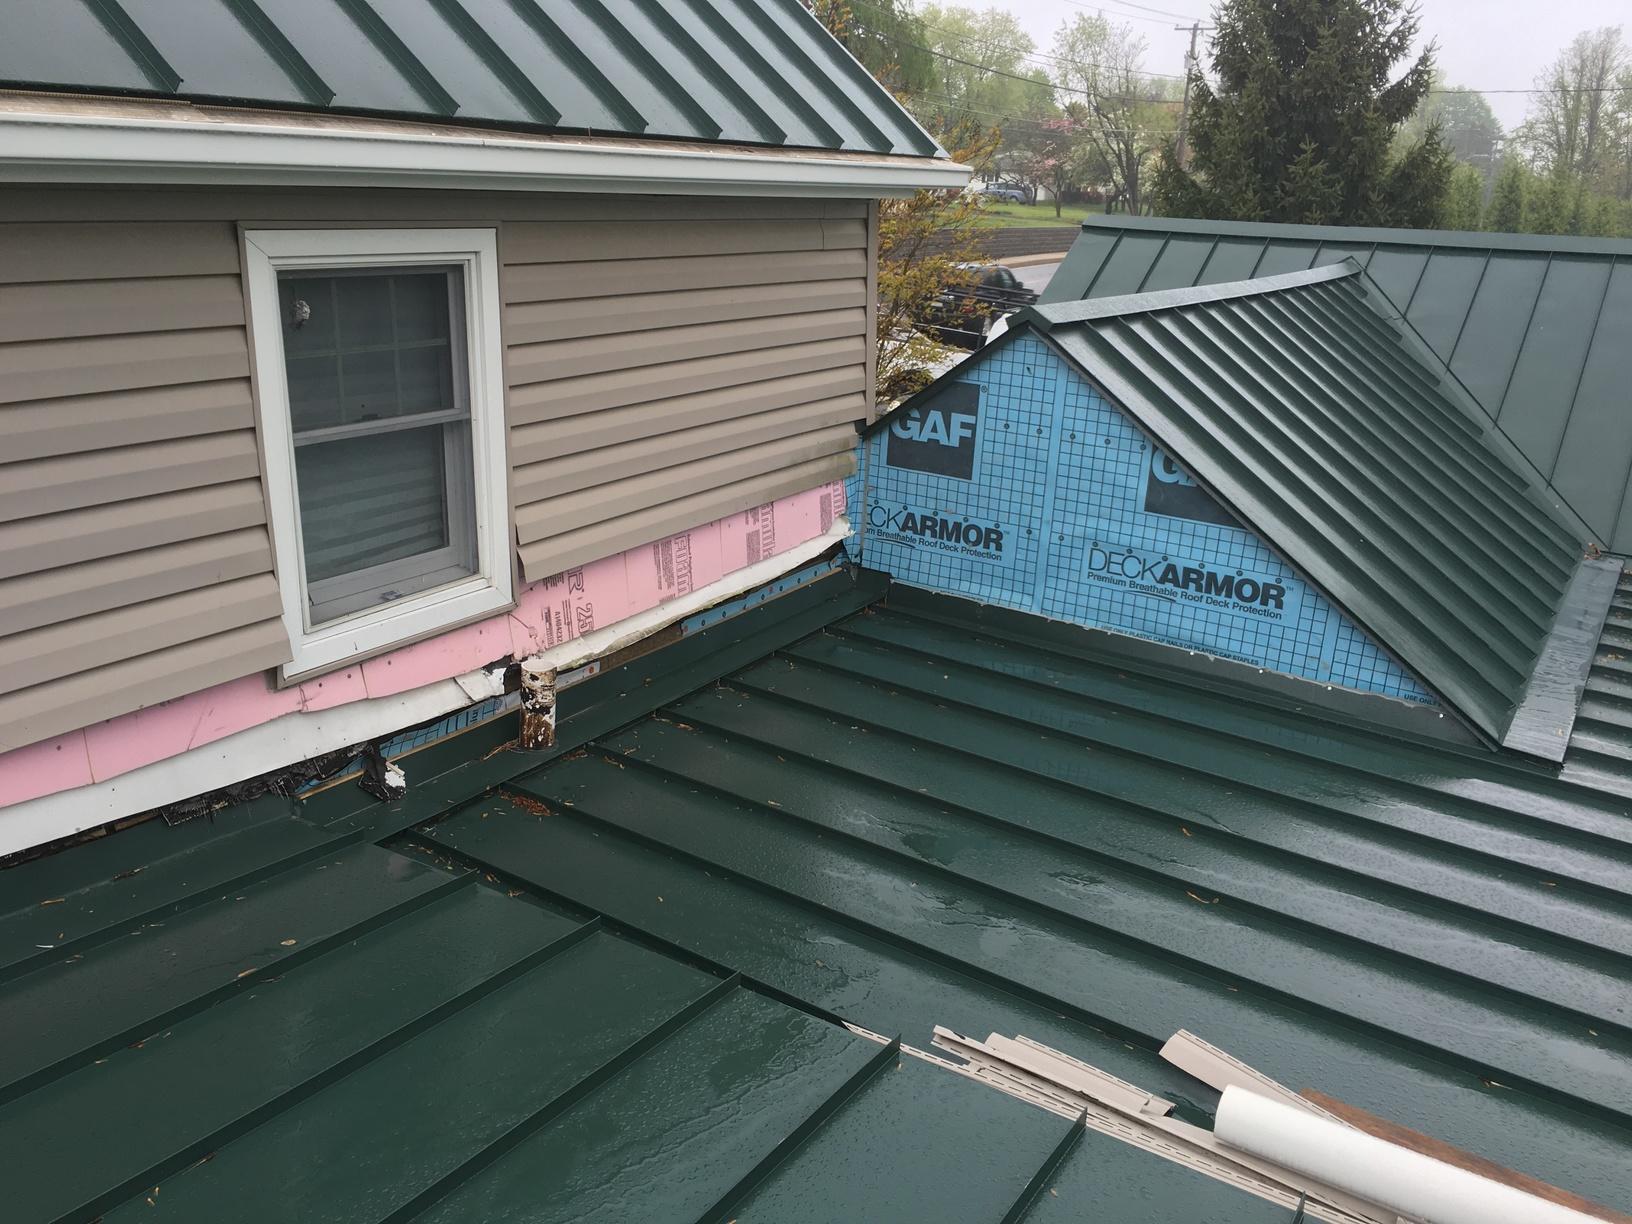 Progress Photo of Hartford Green Standing Seam Metal Roof Installation in Bensalem, PA